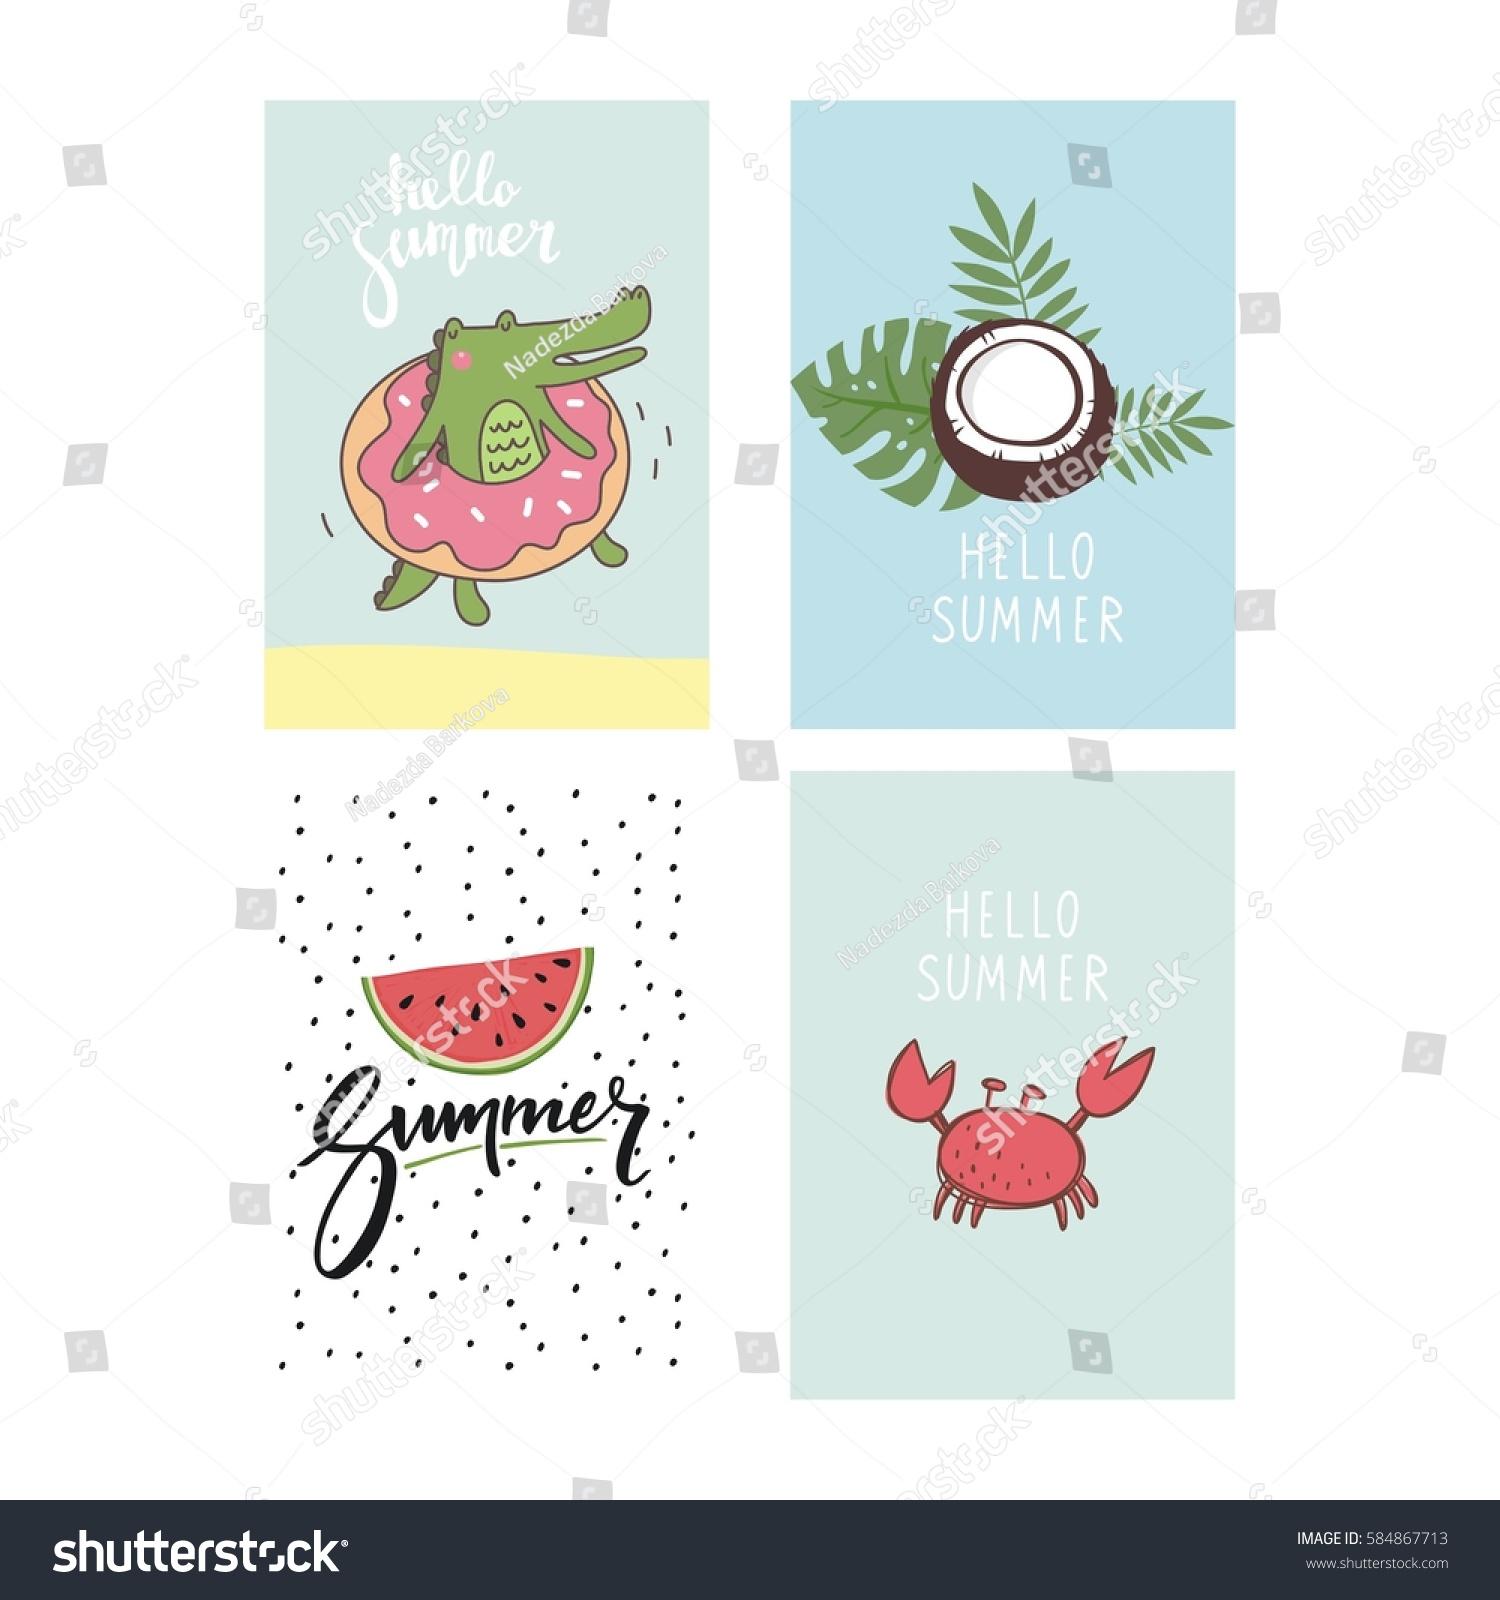 Hello Summer Cute Card Lettering Stock Vector 584867713 - Shutterstock